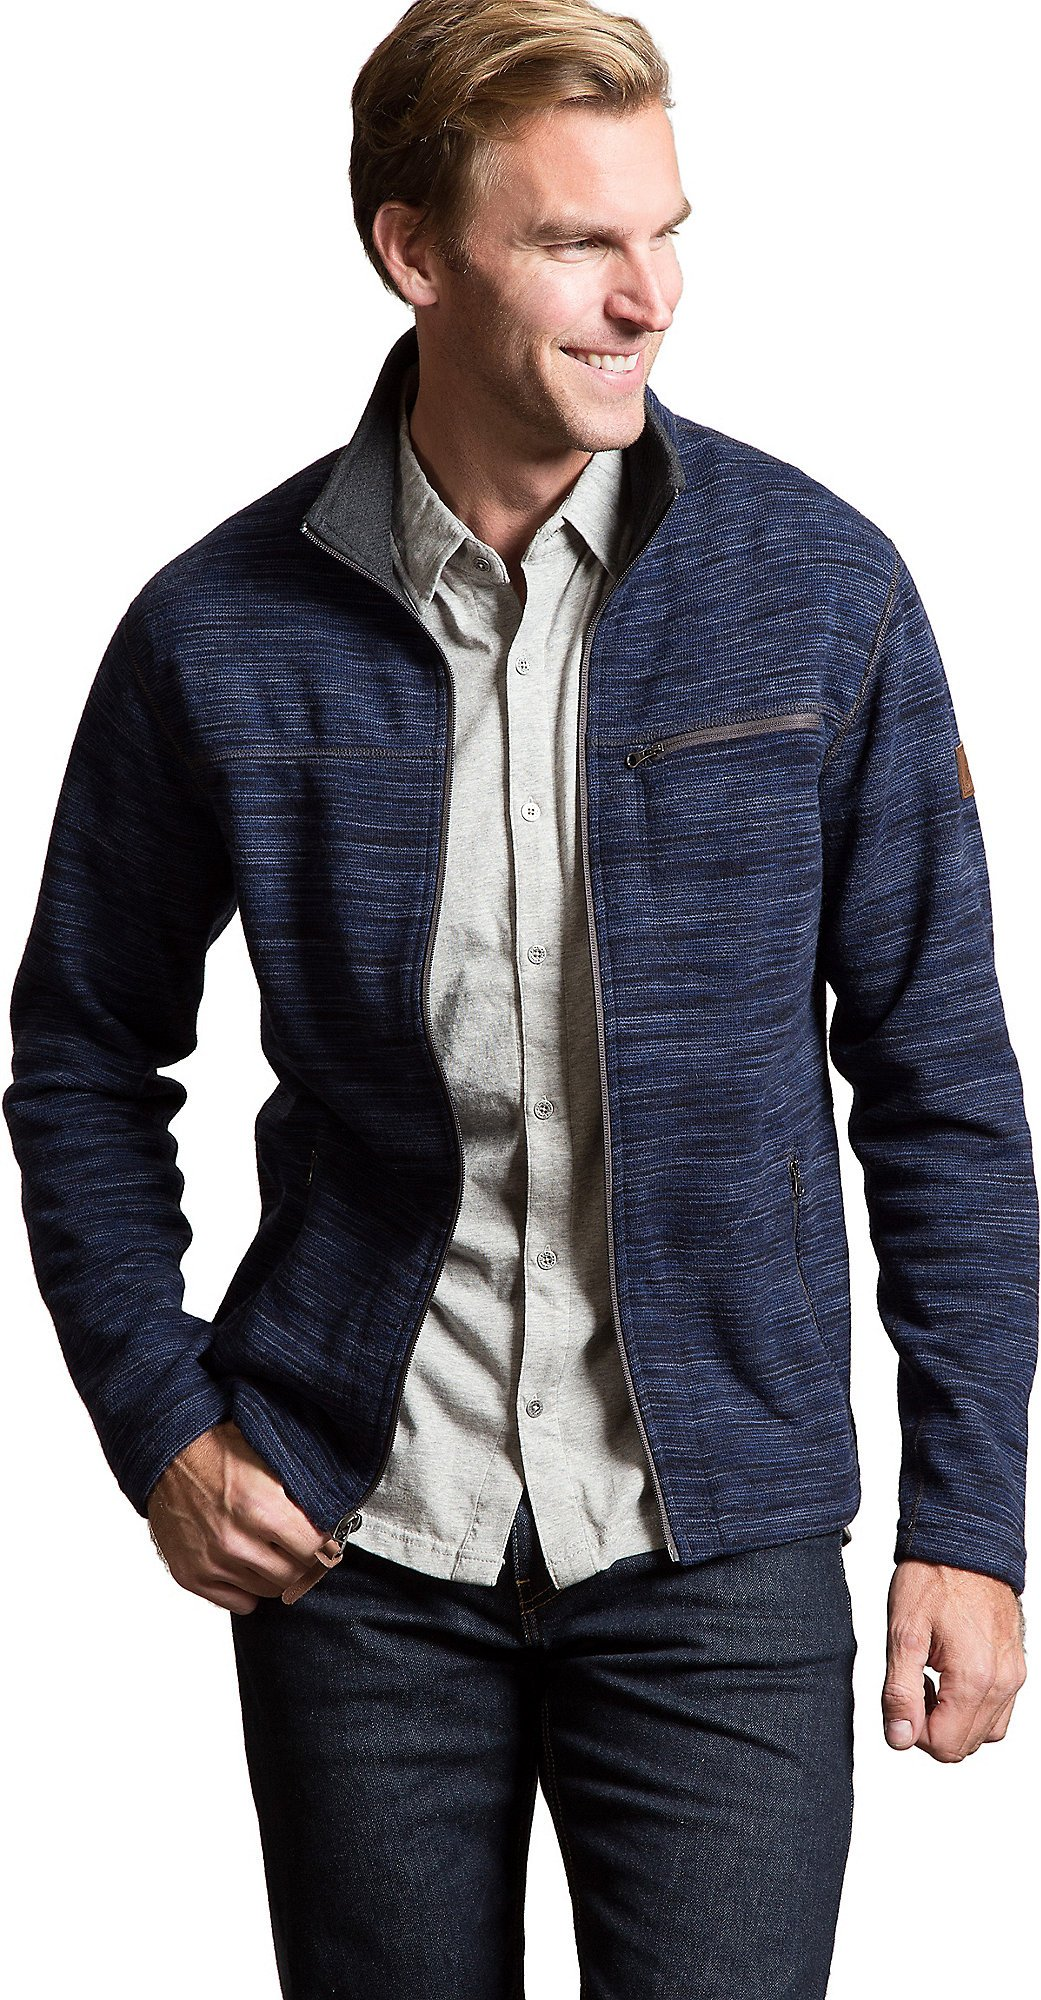 boreas Italian Wool-Blend Fleece Jacket